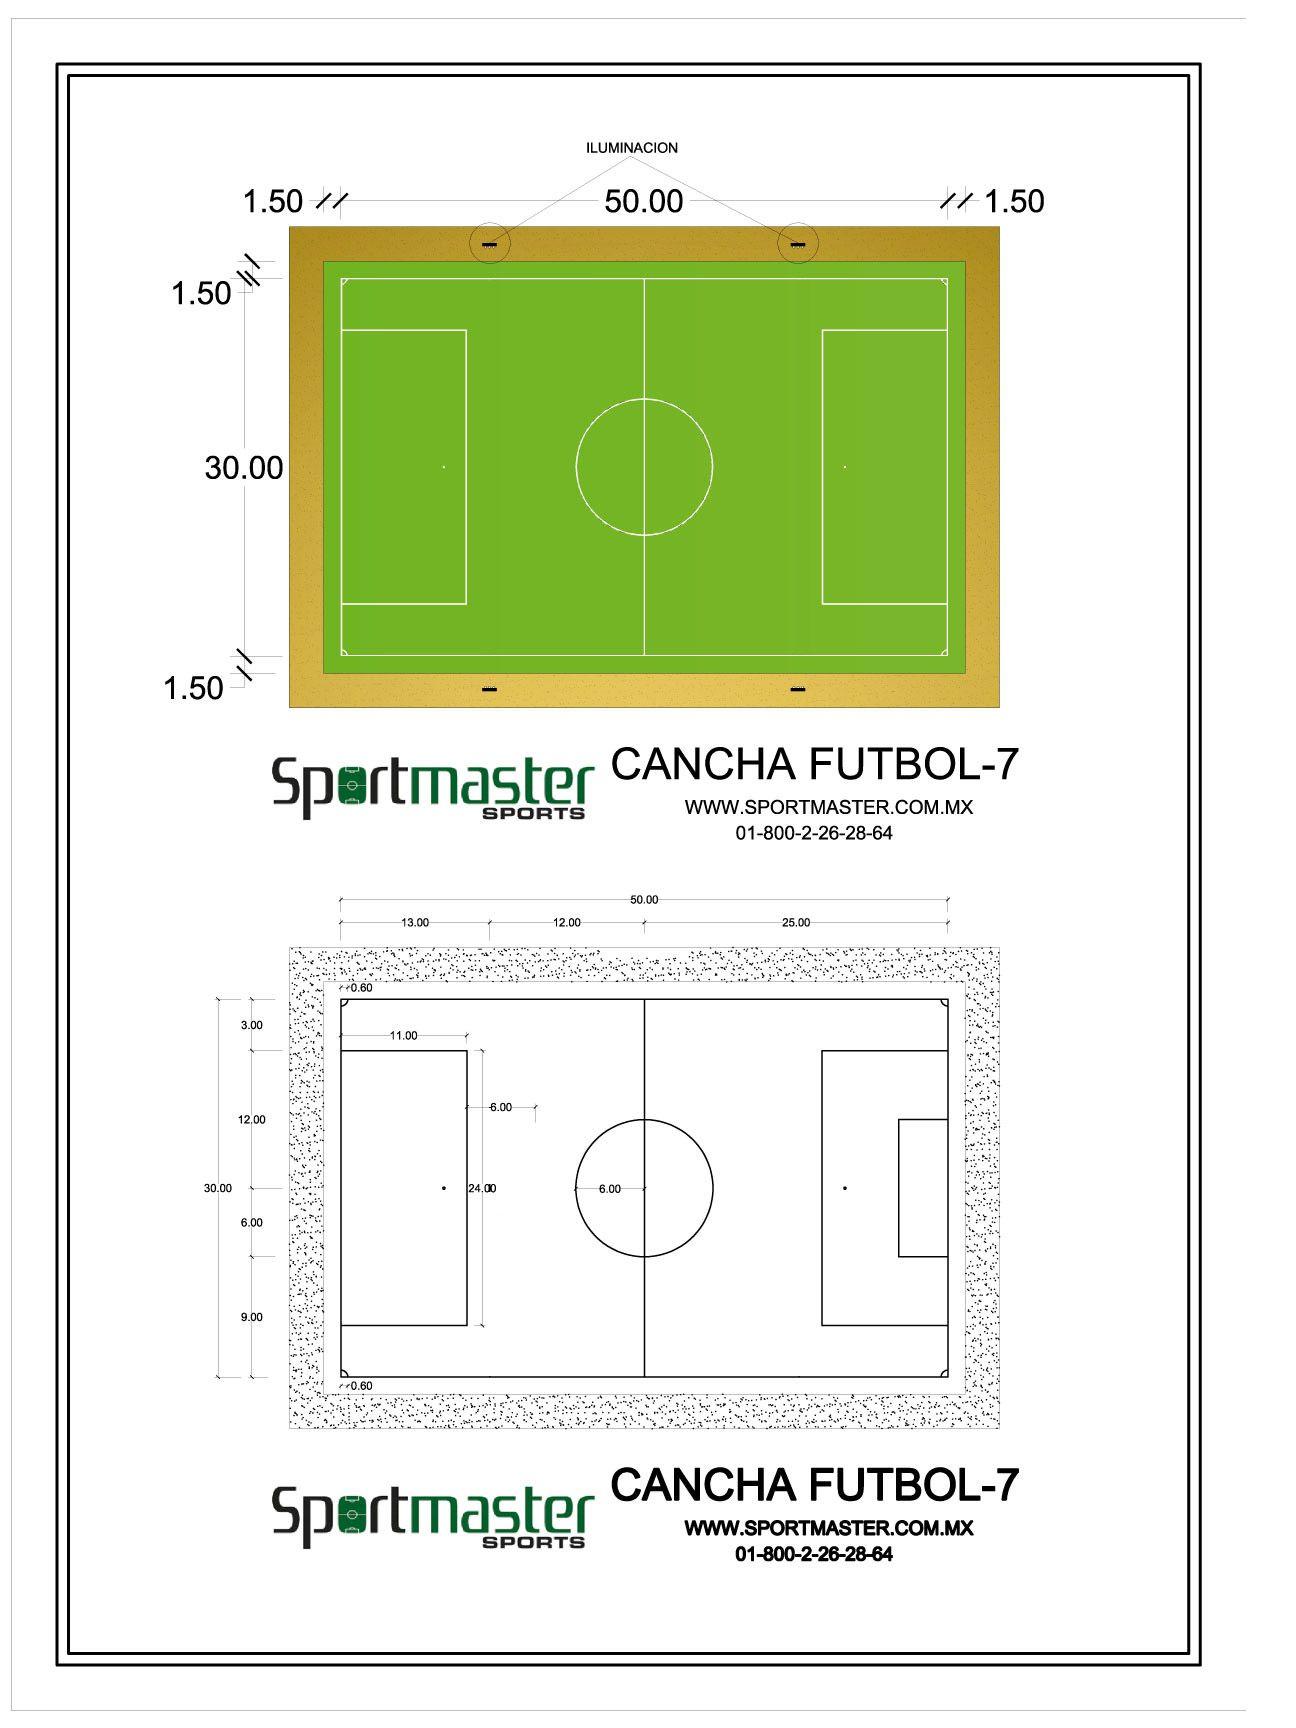 Pin De Johan Dinata En Cancha Amado D Niro Cancha De Futbol Canchas Futbol 7